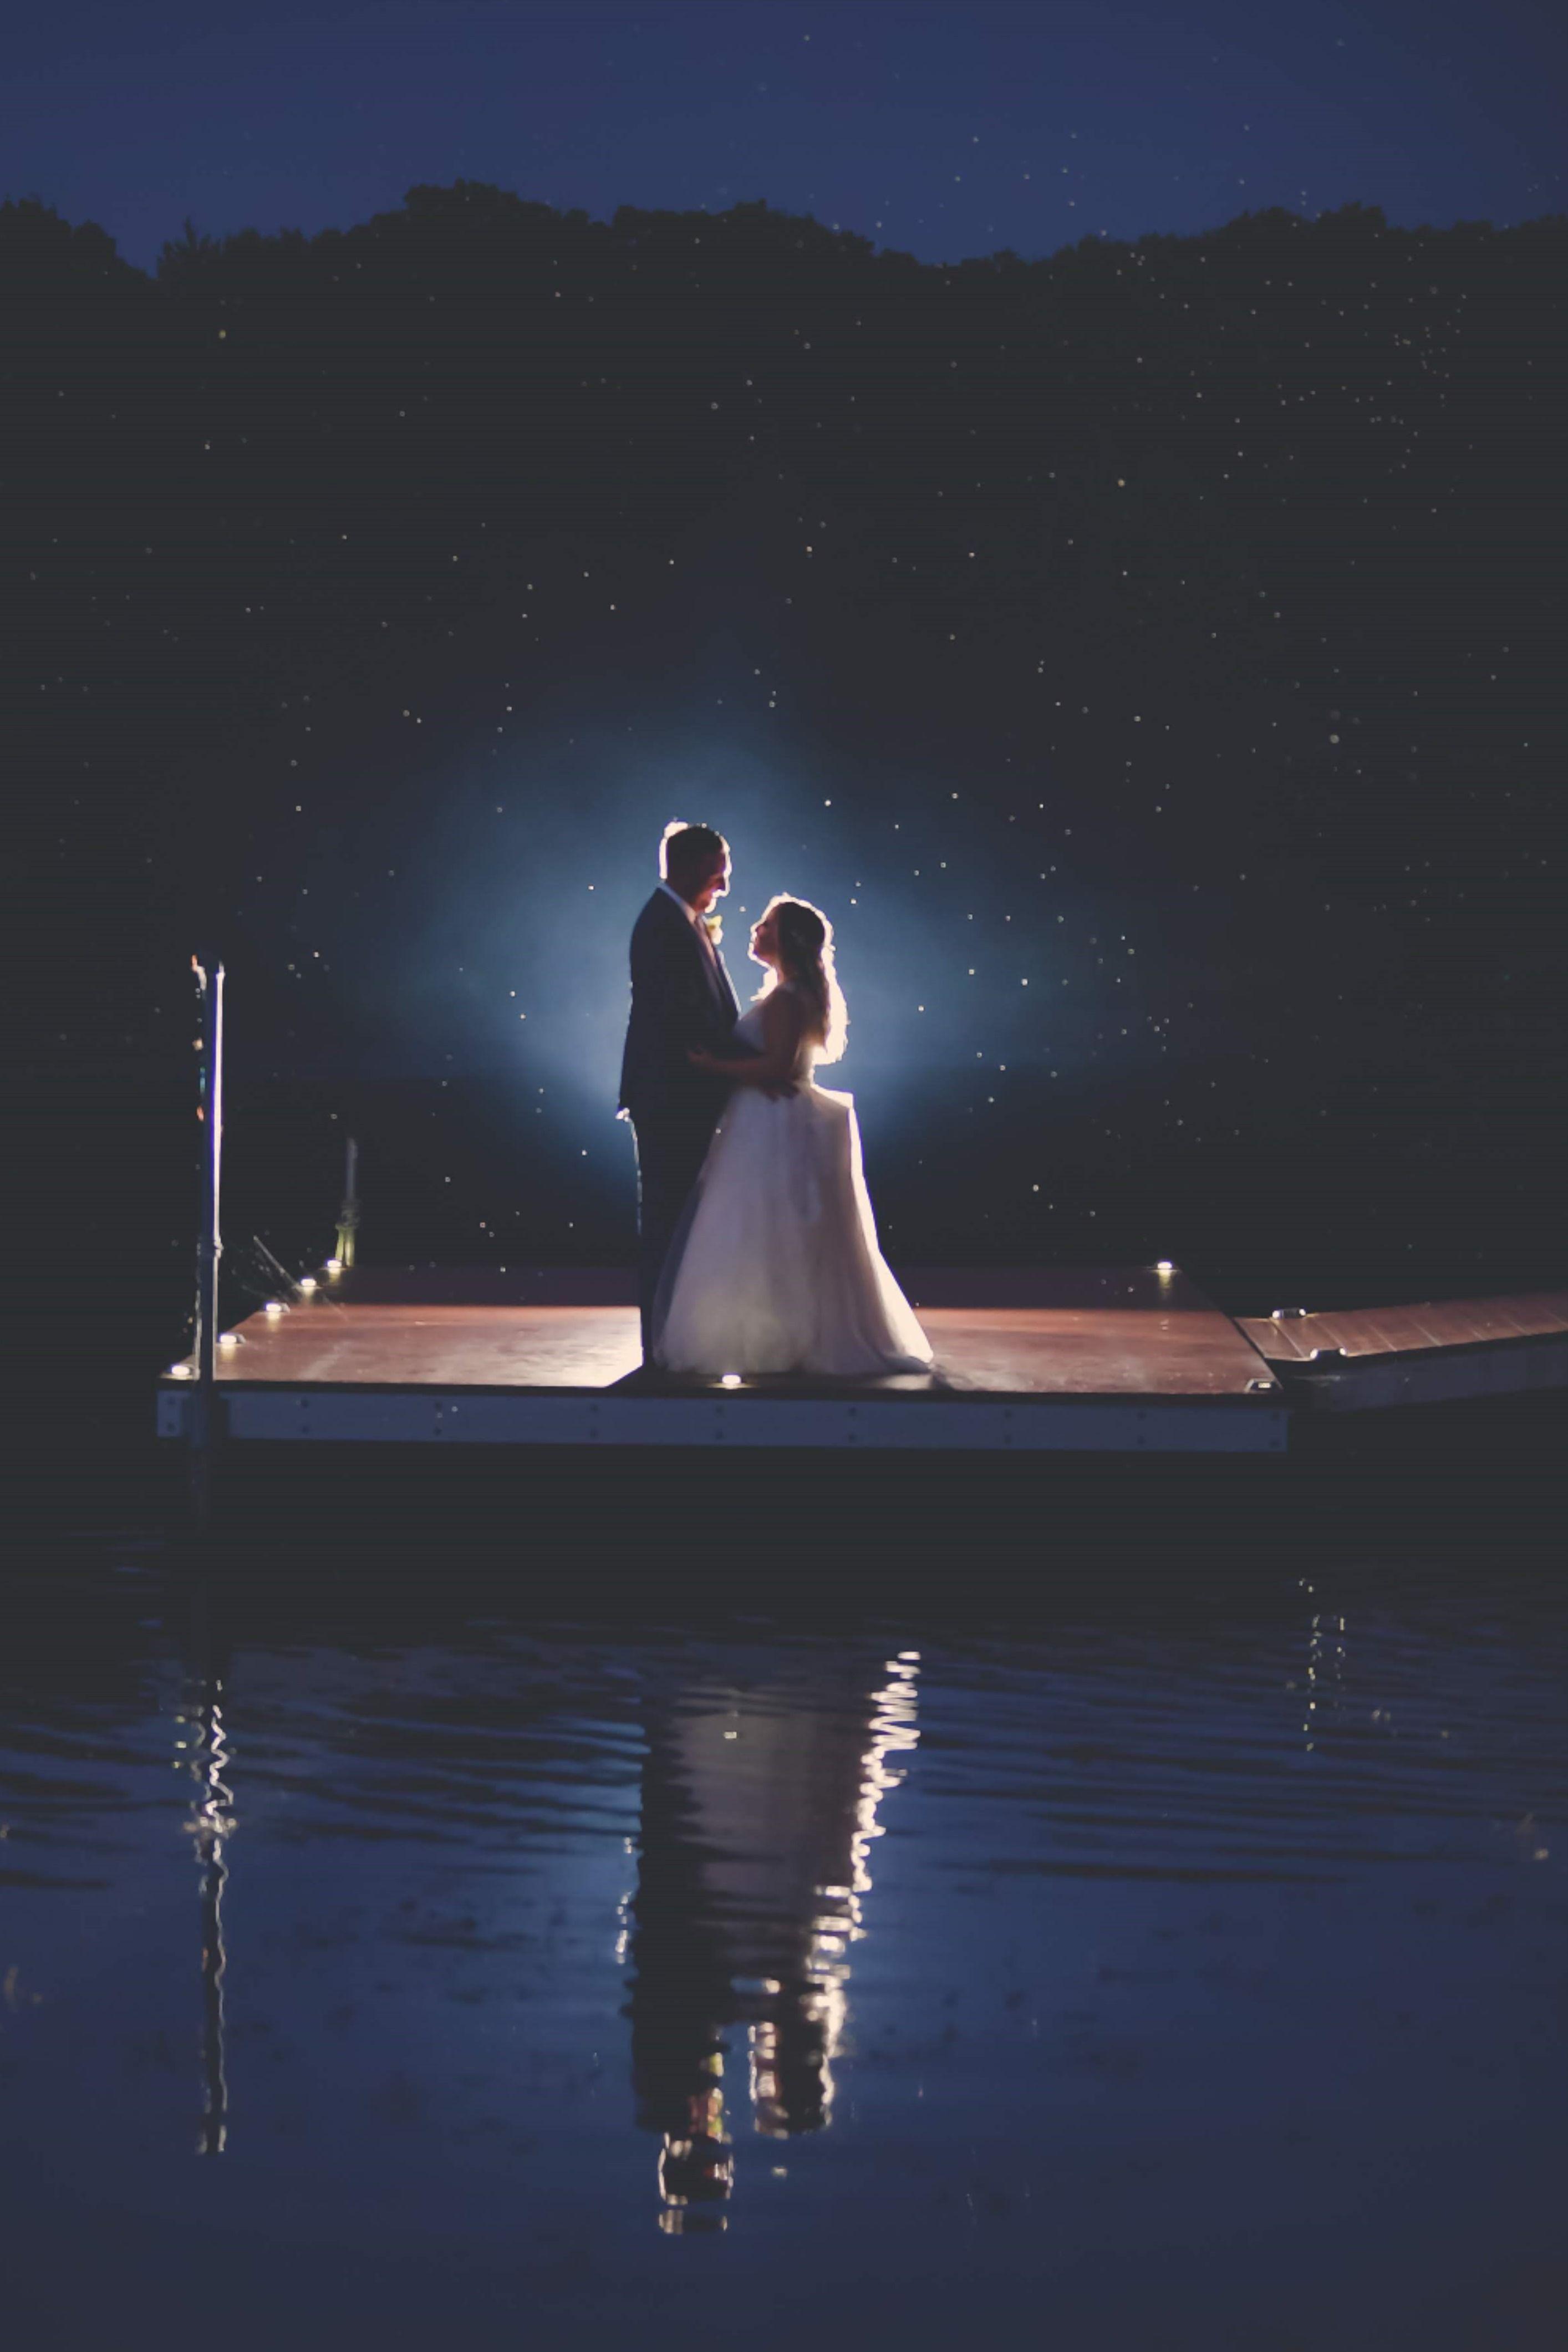 Nighttime Wedding Photos In 2020 Outdoor Night Wedding Night Wedding Photos Night Wedding Photography